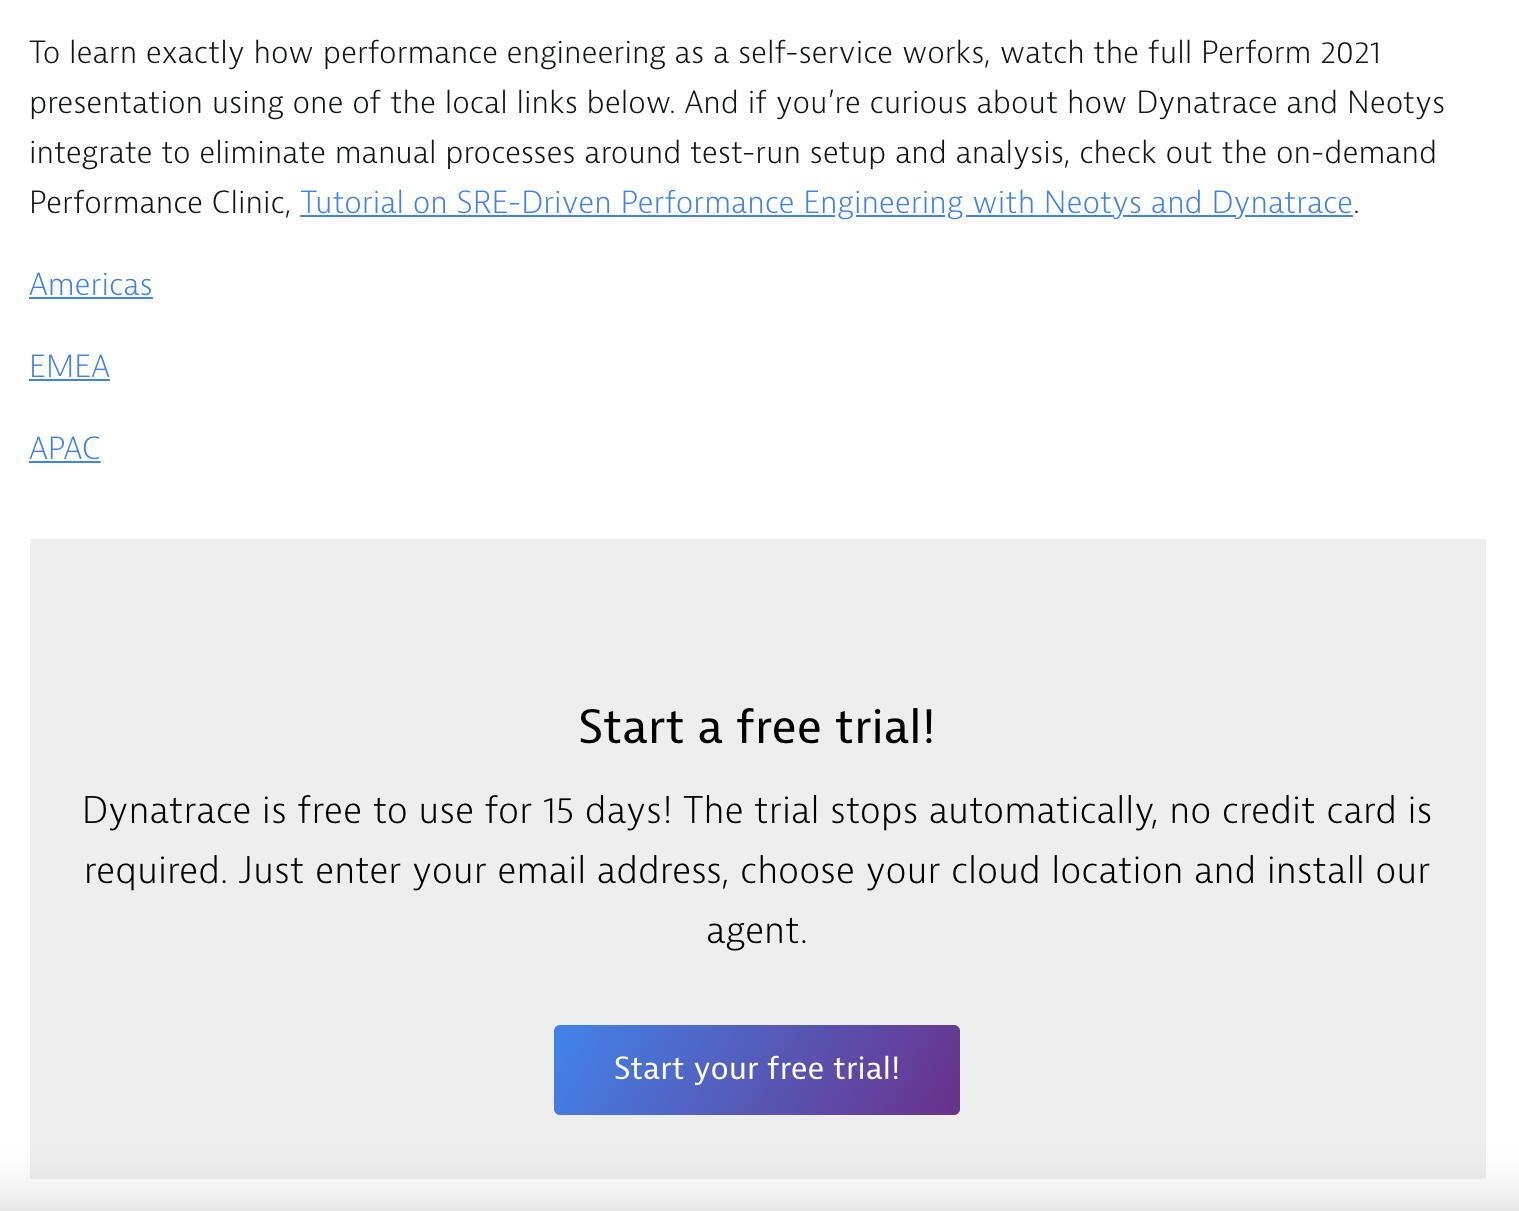 Screenshot of a Dynatrace article featuring a Demo Request CTA